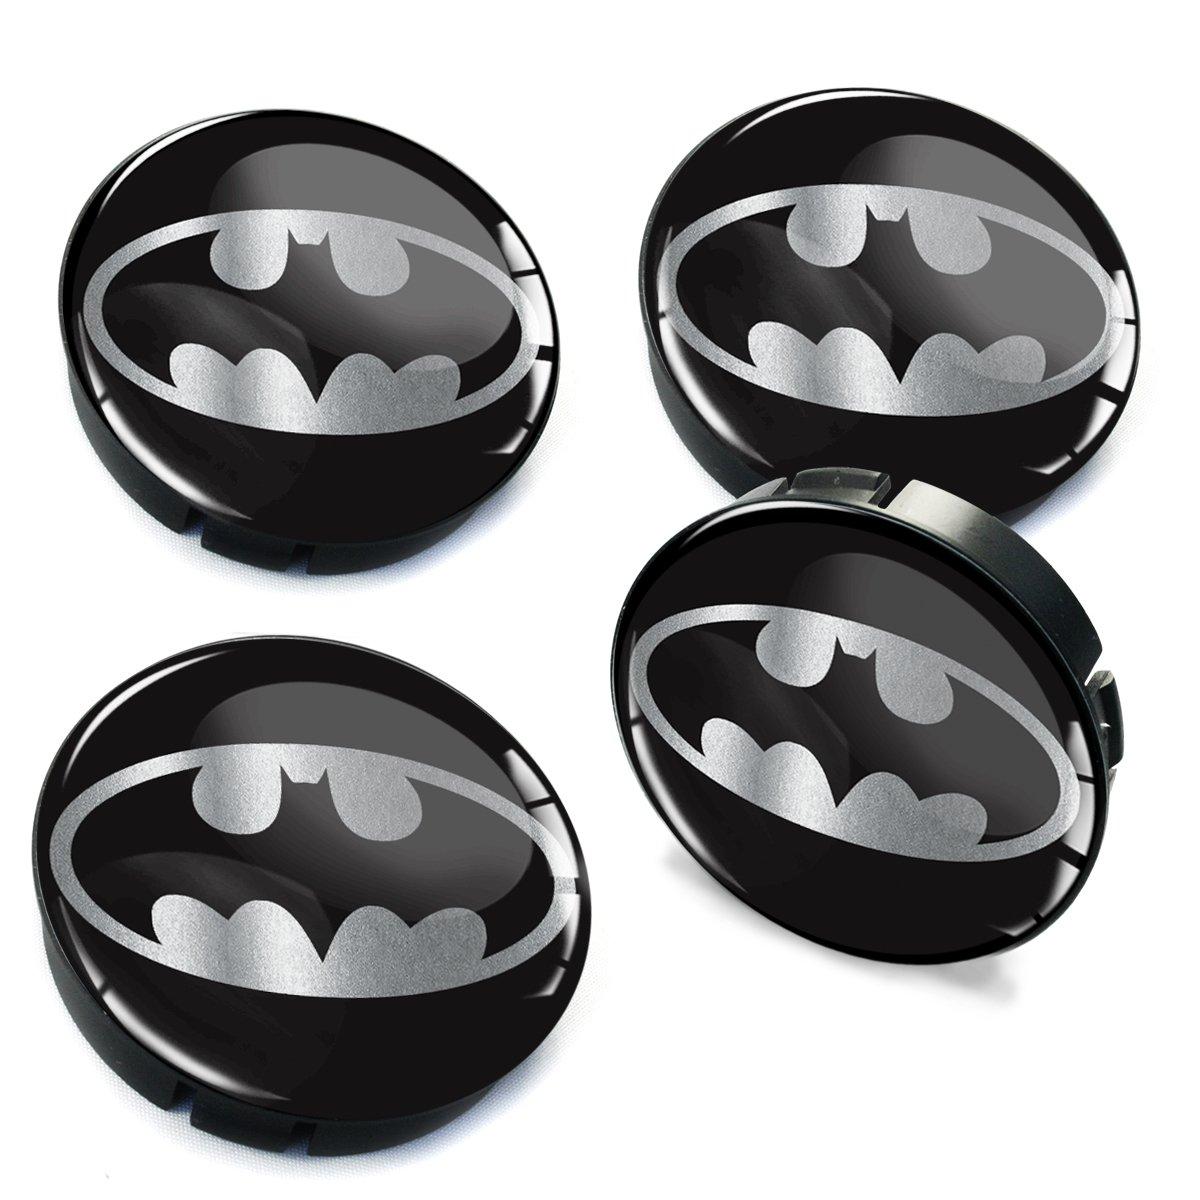 Skino 4 x 60mm Silikon Nabenkappen Kappen Batman Silber Felgendeckel Radkappen Radnabendeckel Nabendeckel Auto Tuning C 72